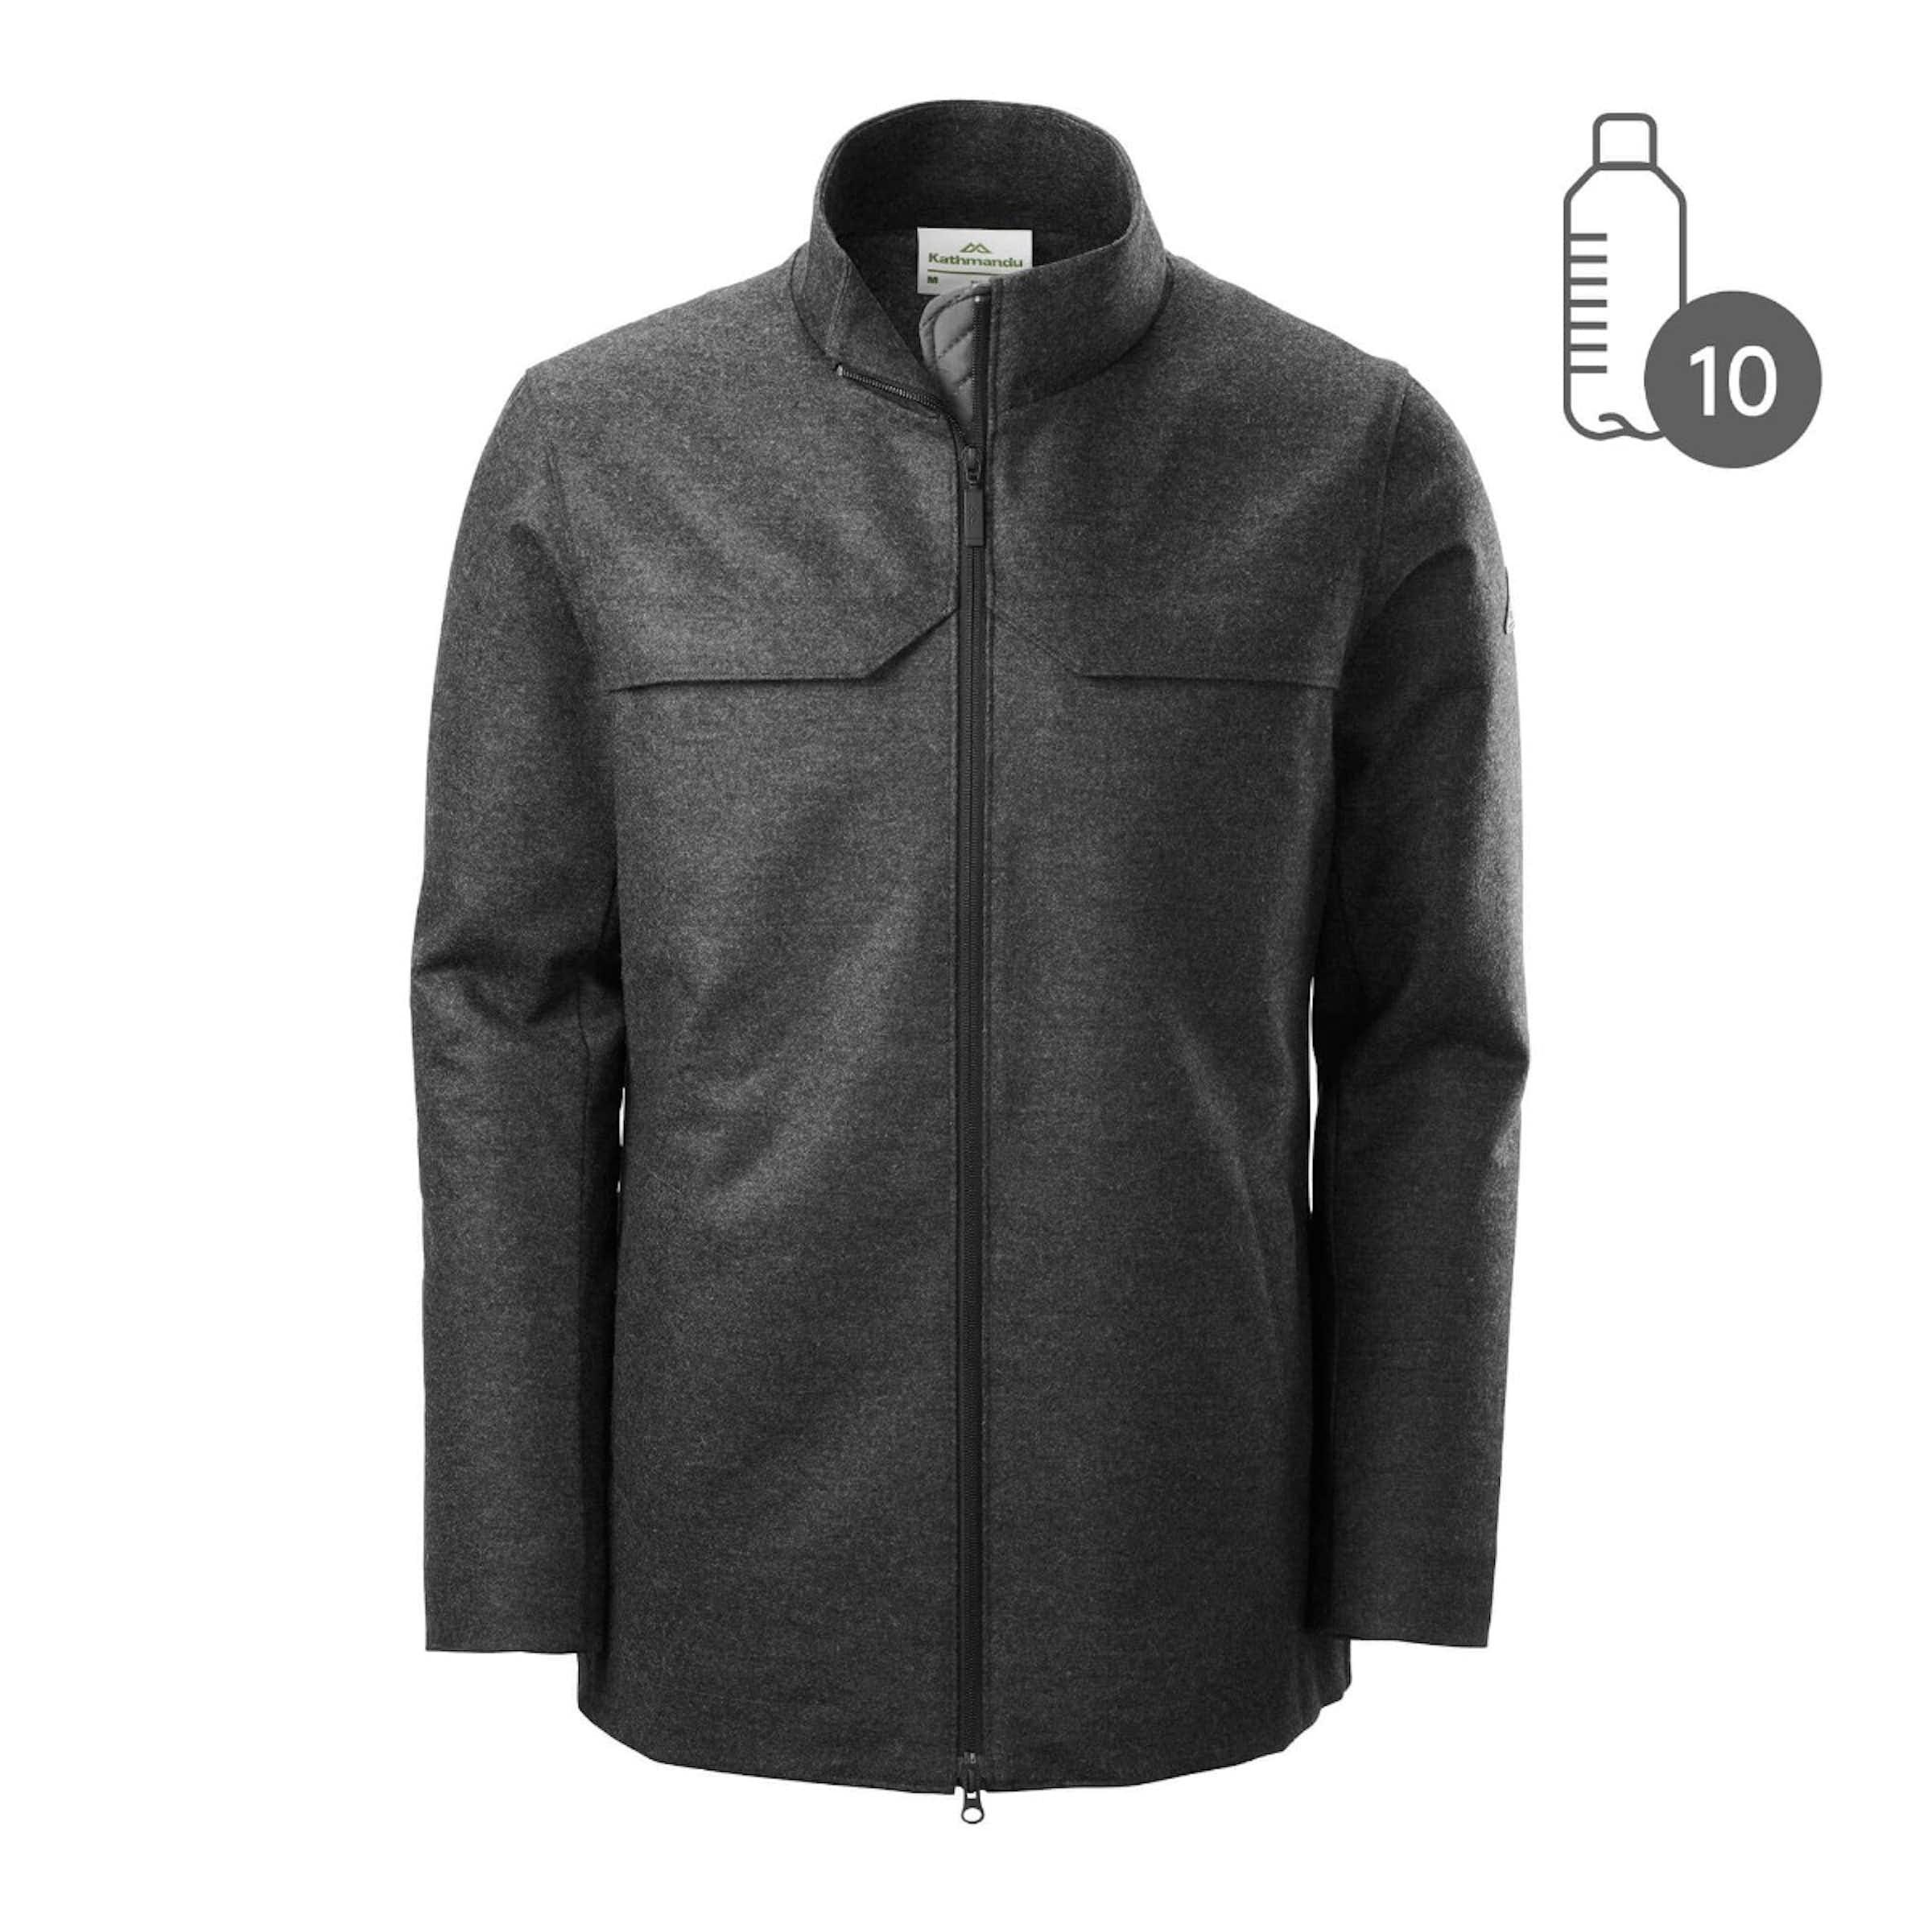 67def854e68062 Mens Jackets for Sale Online | Winter Coats for Men in Australia